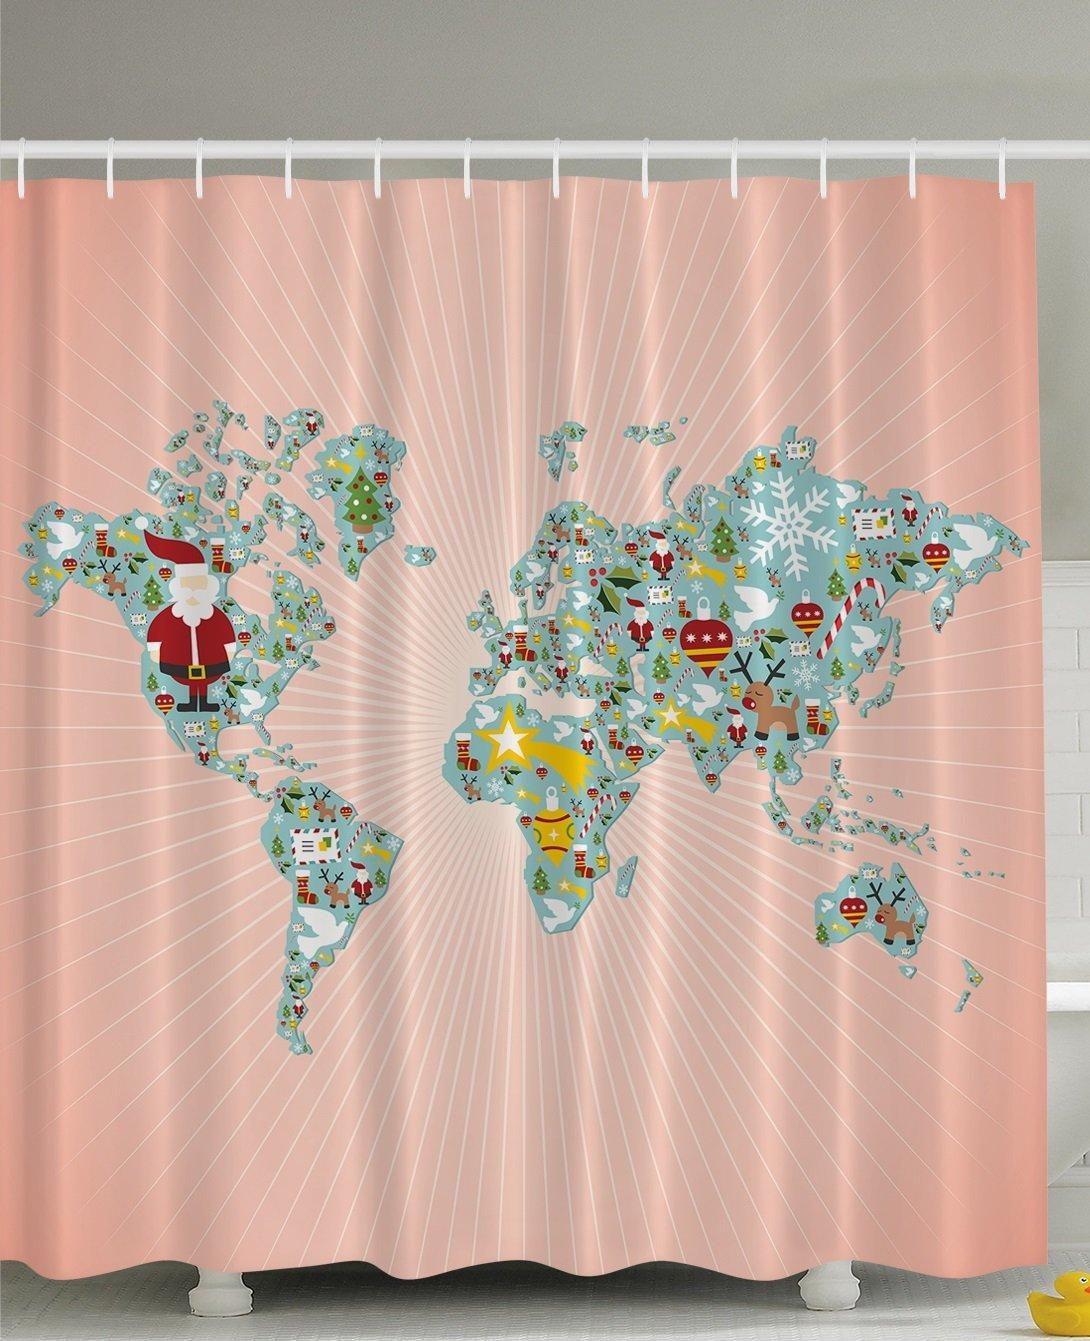 Us 14 17 38 Off Winter World Map Bathroom Funny Education Peach Design Digital Print Polyester Atlas Fabric Fun Shower Curtain In Shower Curtains